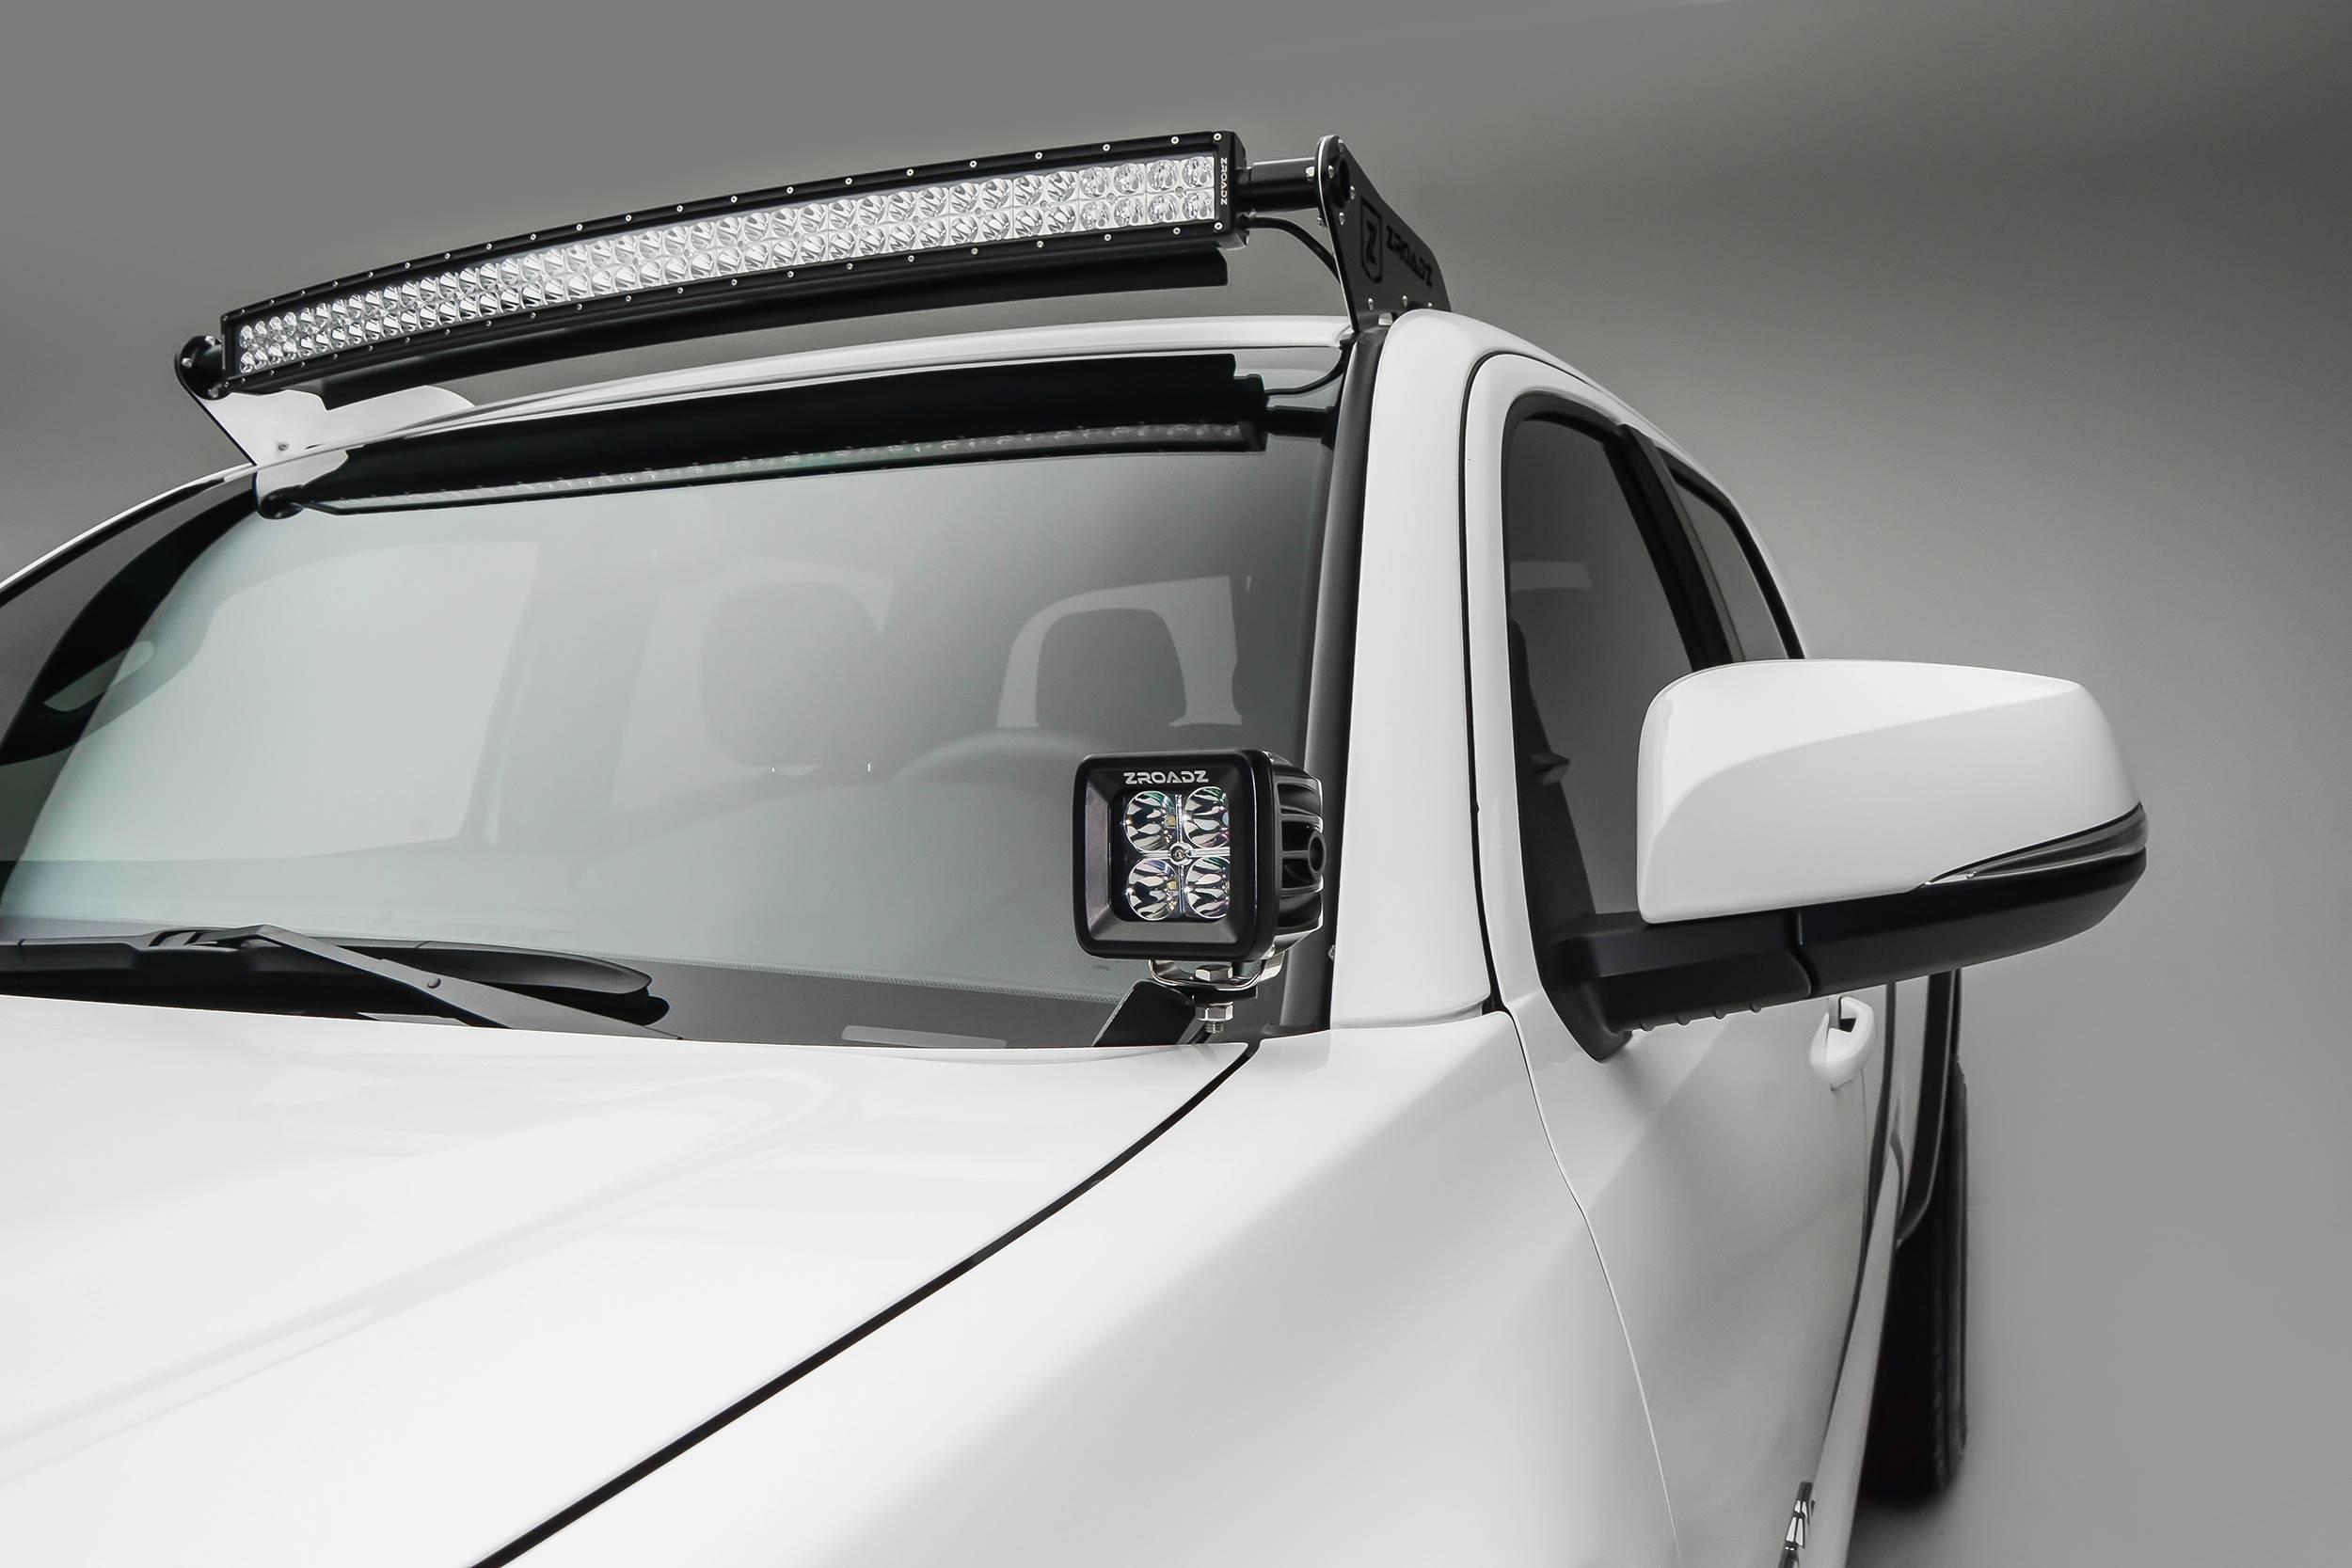 ZROADZ OFF ROAD PRODUCTS - 2016-2021 Toyota Tacoma Hood Hinge LED Kit with (2) 3 Inch LED Pod Lights - PN #Z369401-KIT2